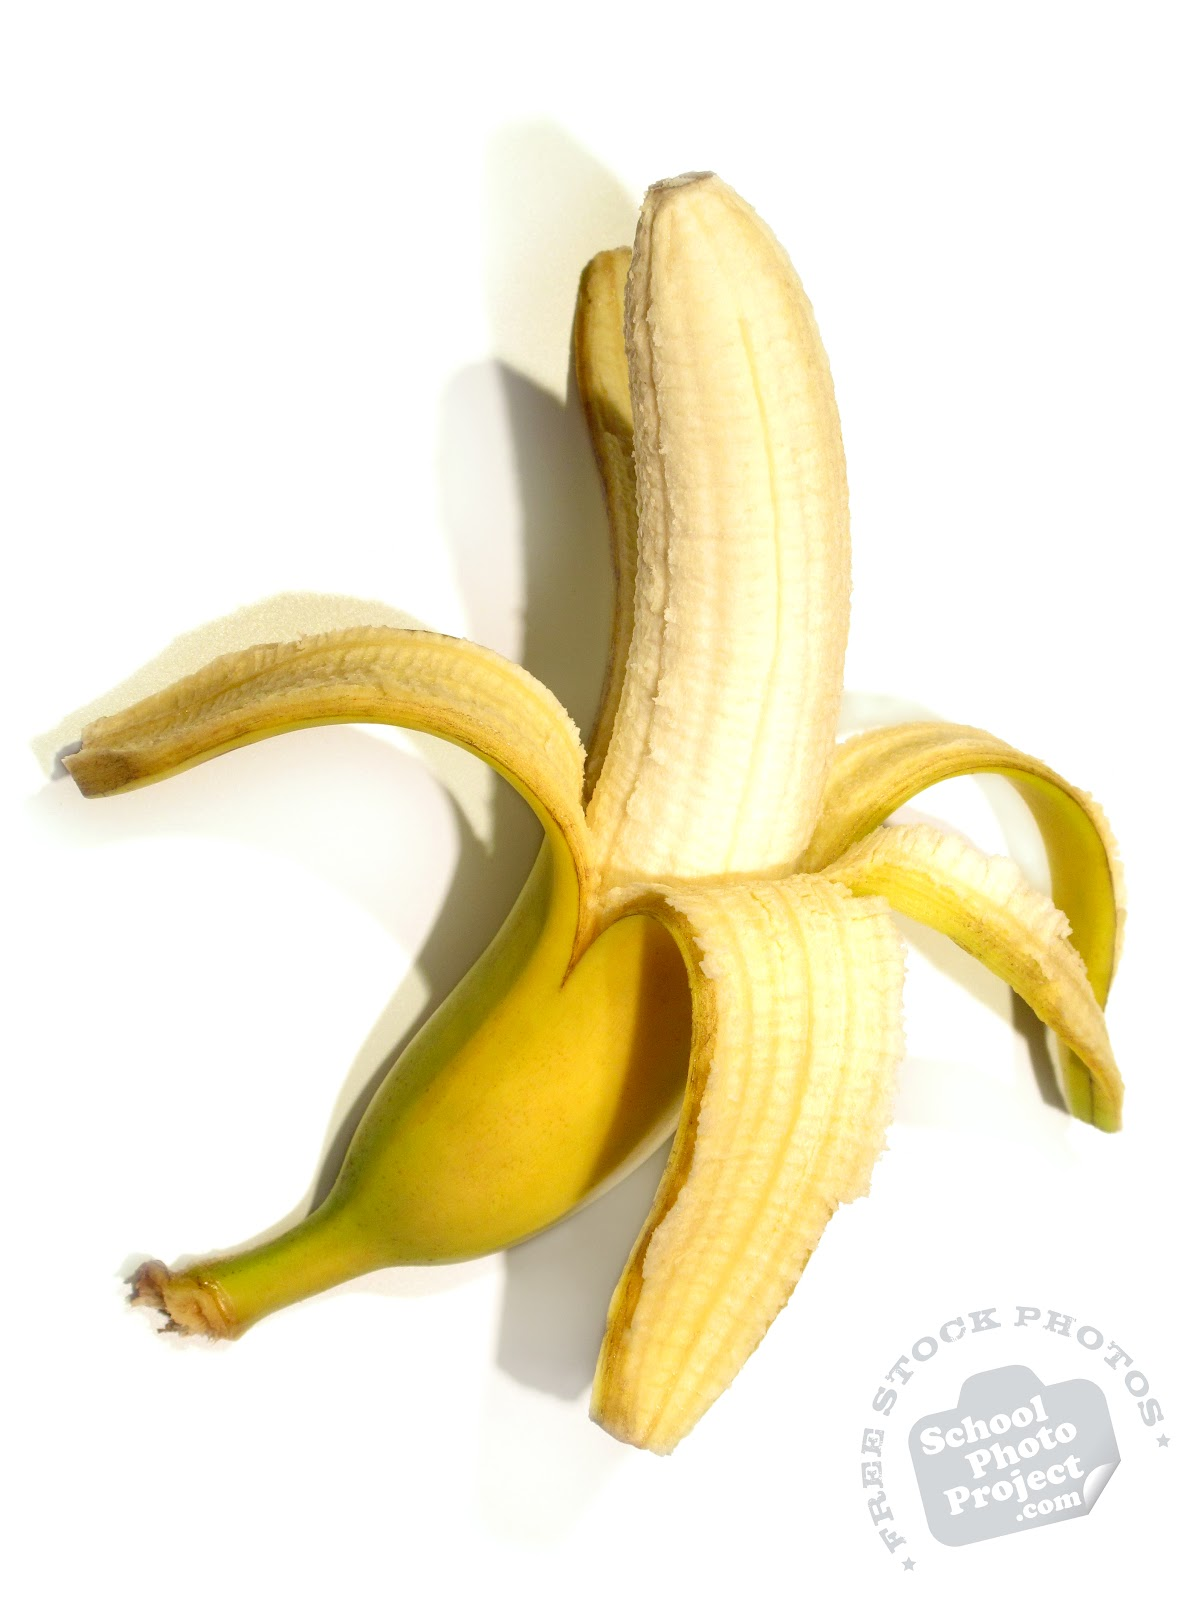 peeled-banana-photo1-l.jpg